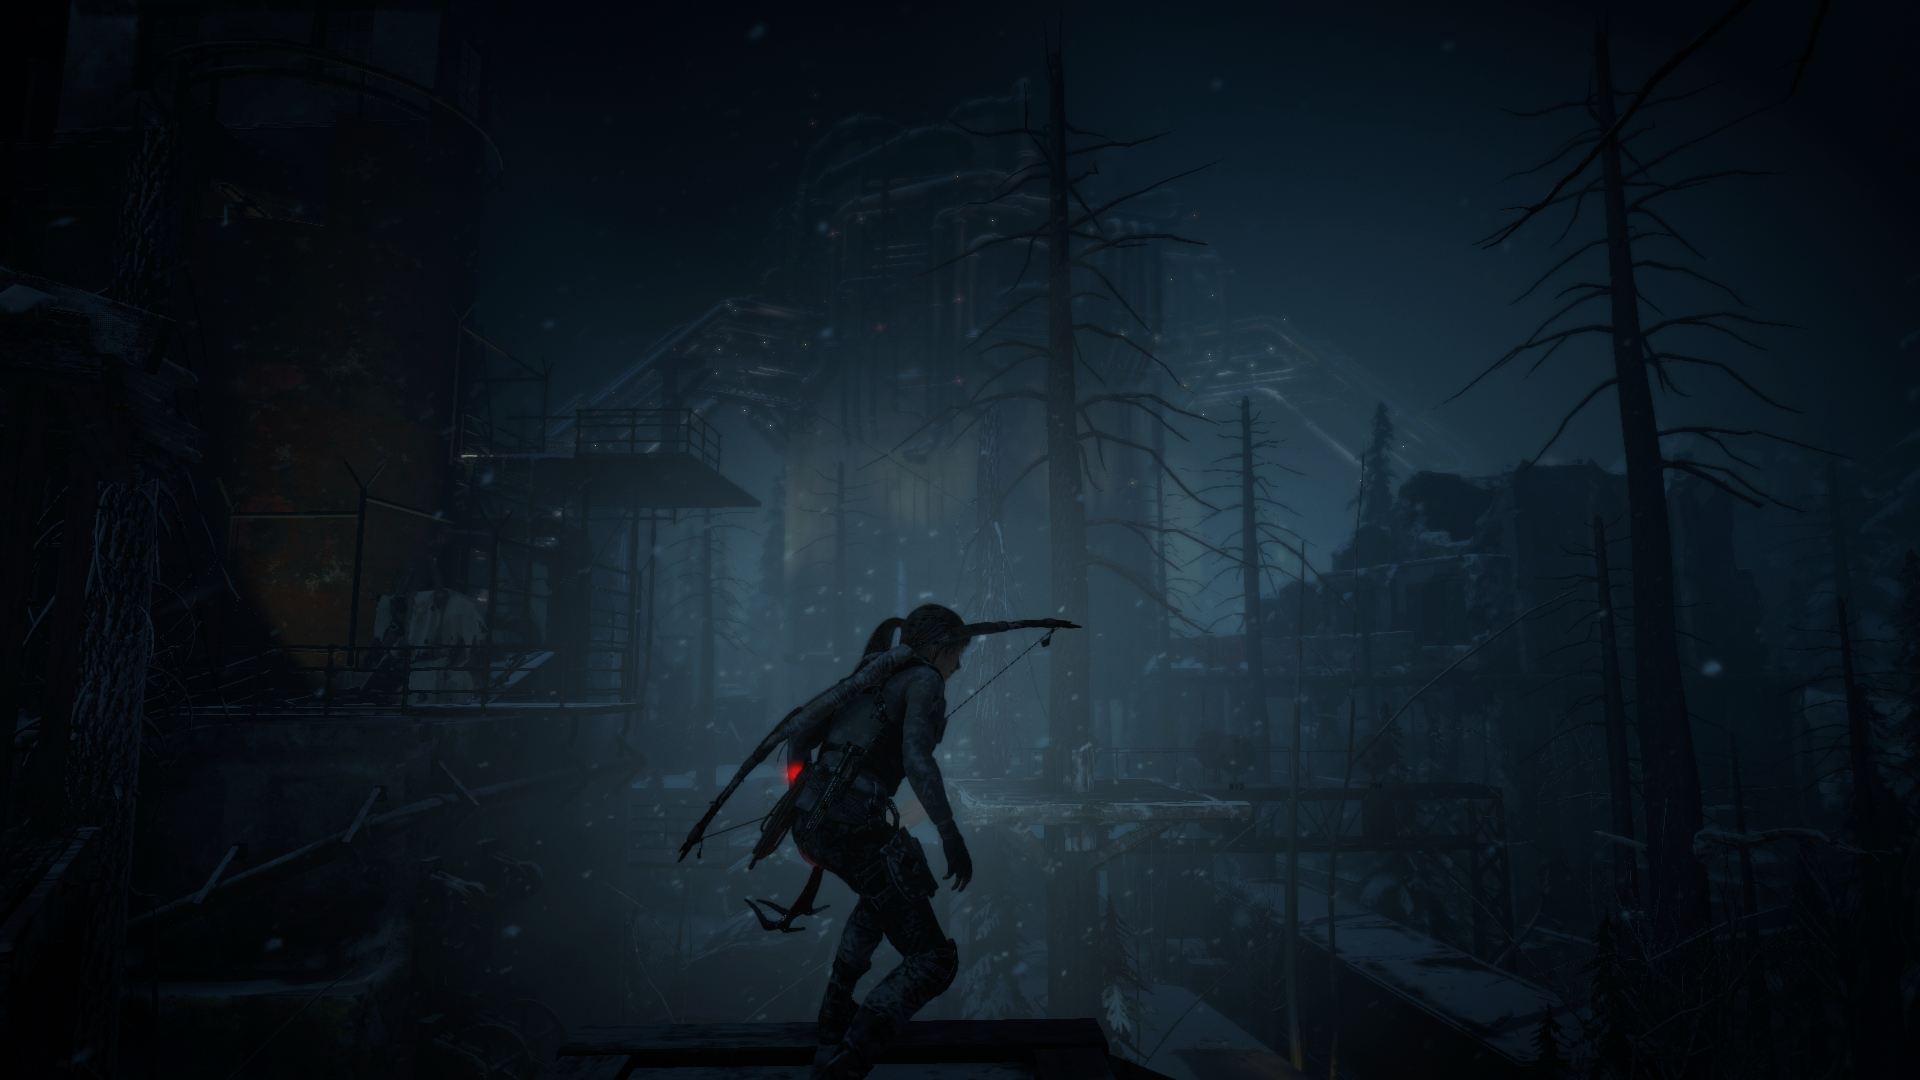 Rise of the tomb raider cold darkness awakened screenshots - Rise of the tomb raider cold darkness ...